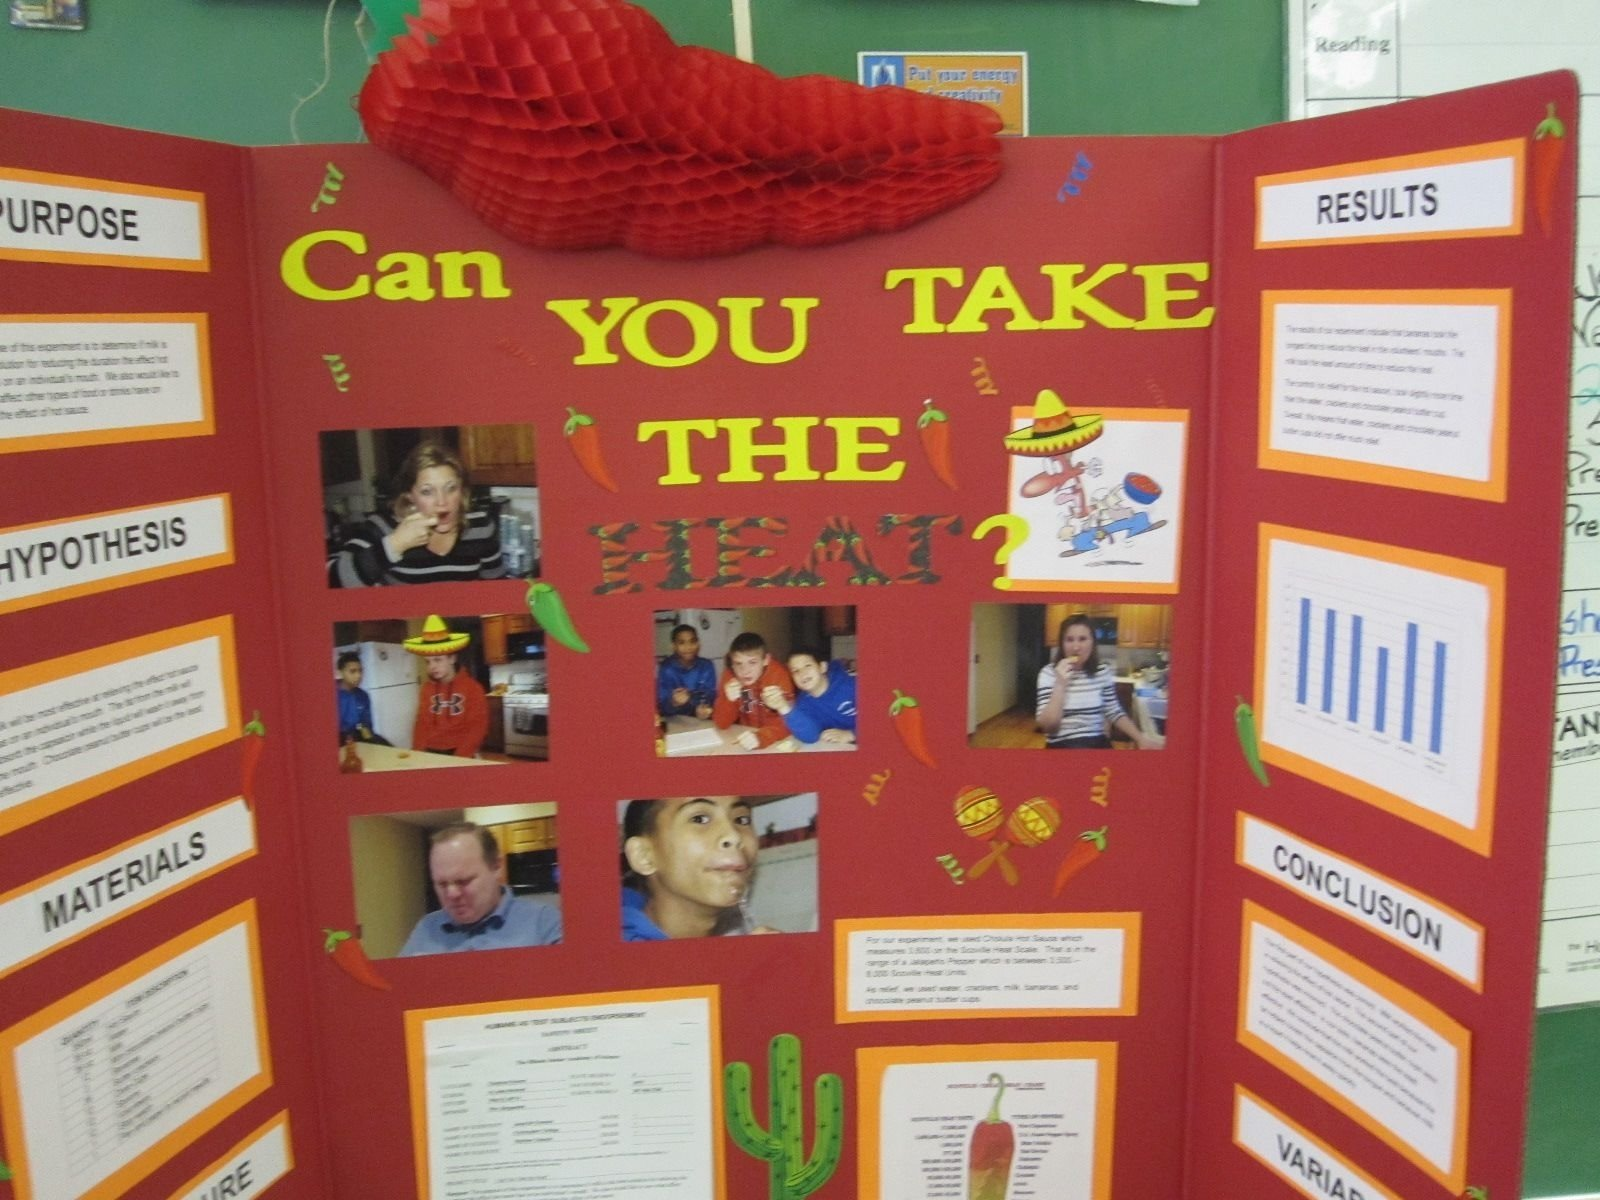 10 Famous Science Fair Project Ideas For 8Th Grade second grade science fair topics learnkids science im kinda 15 2021